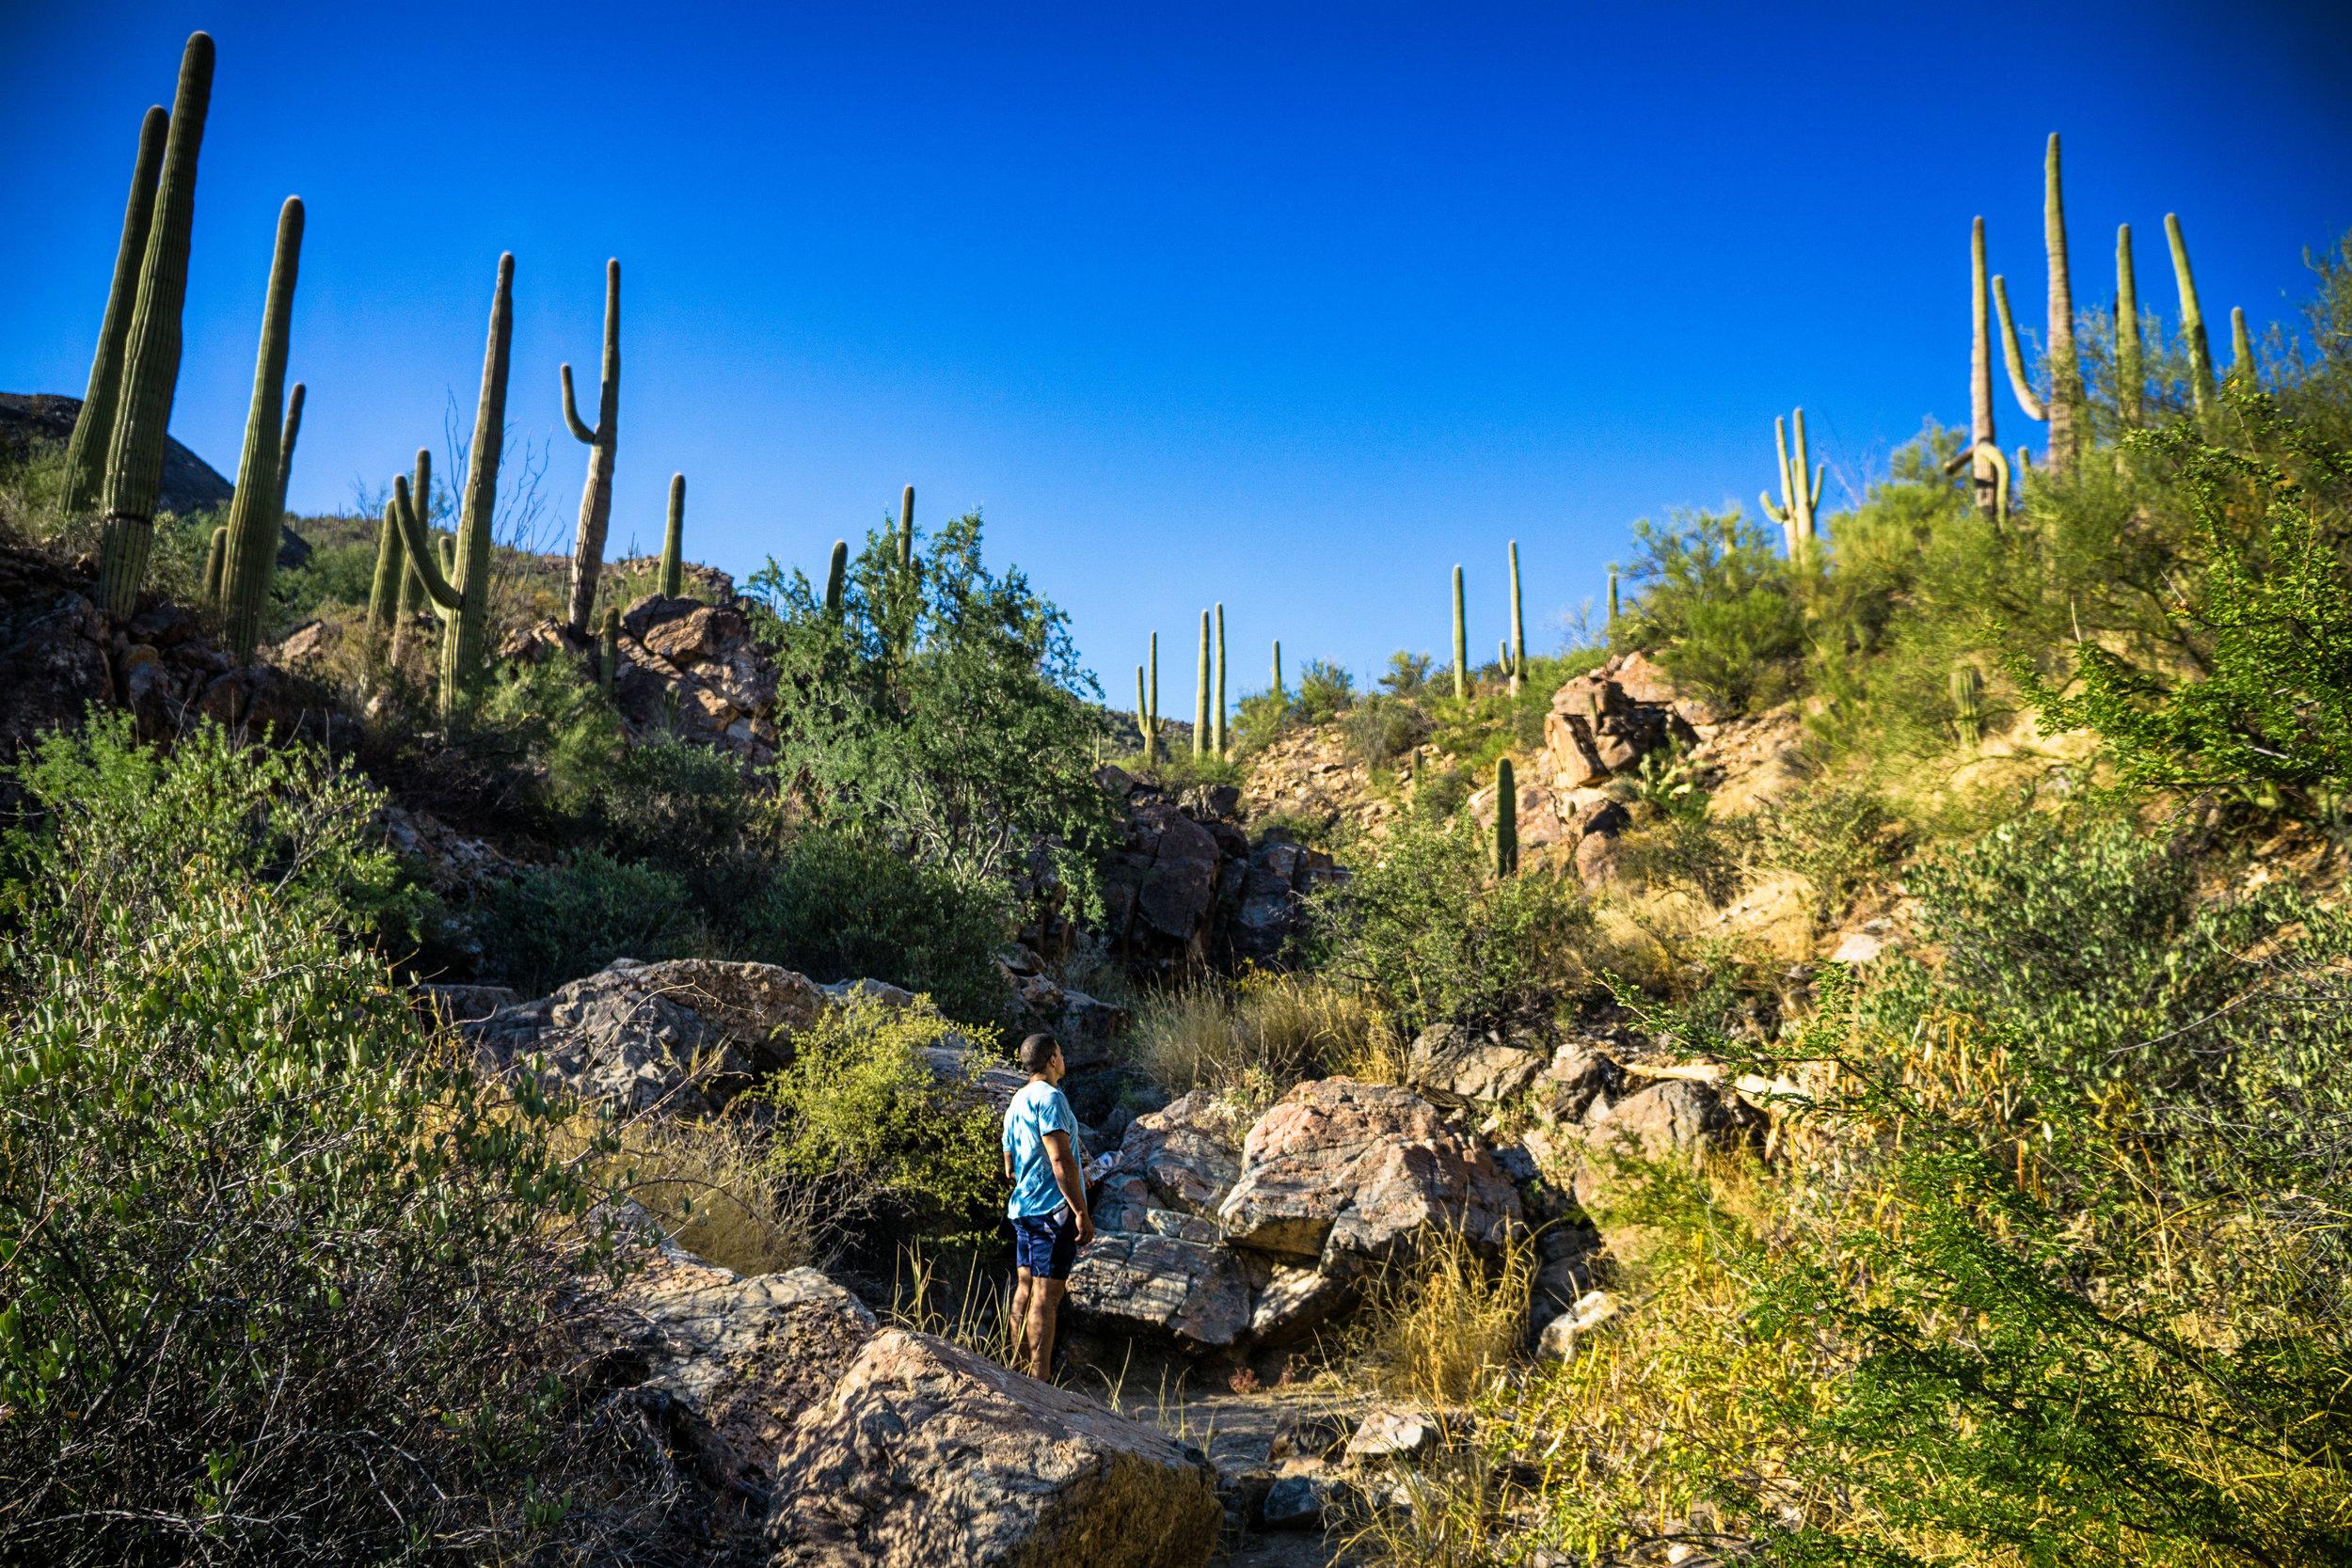 vickygood_photography_nature_saguaro-park5.jpg